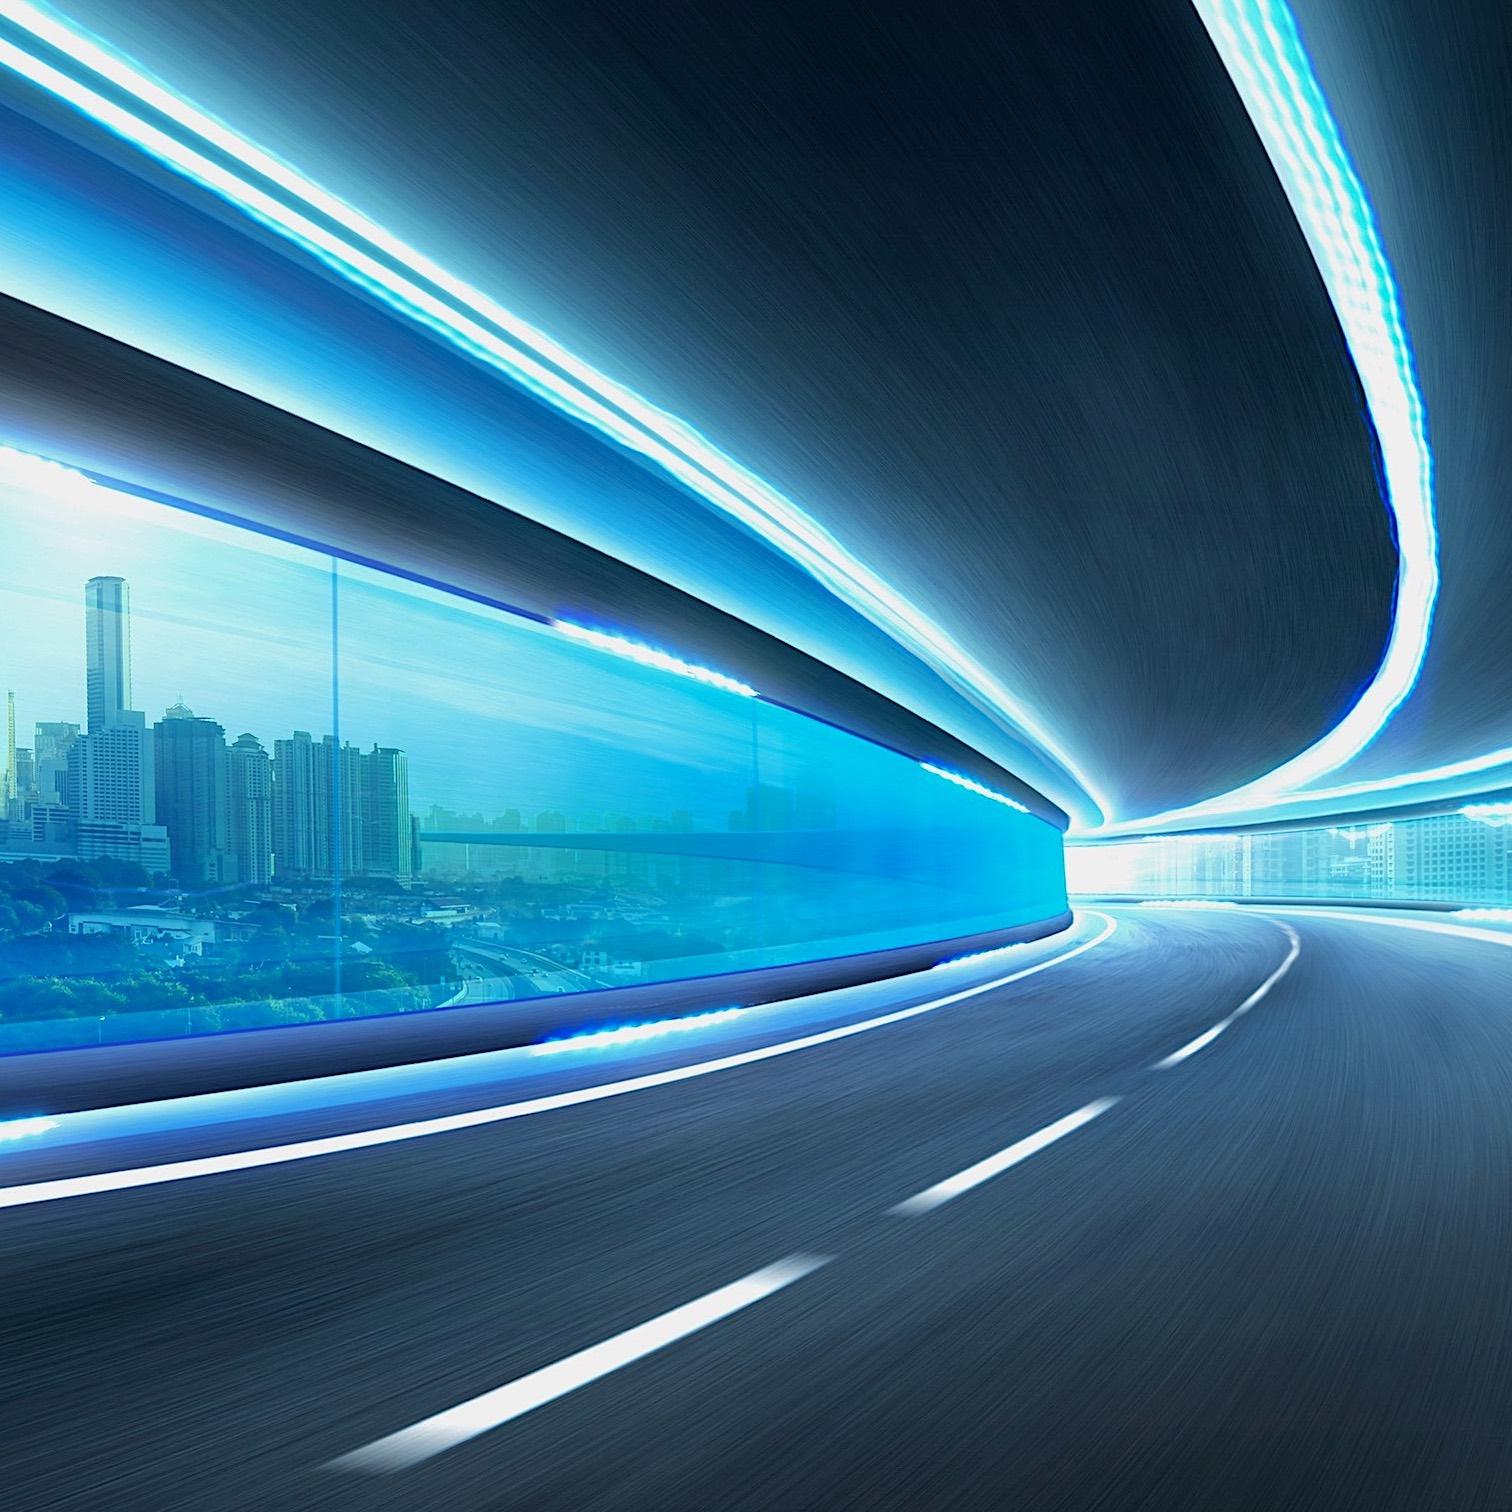 futuristic road